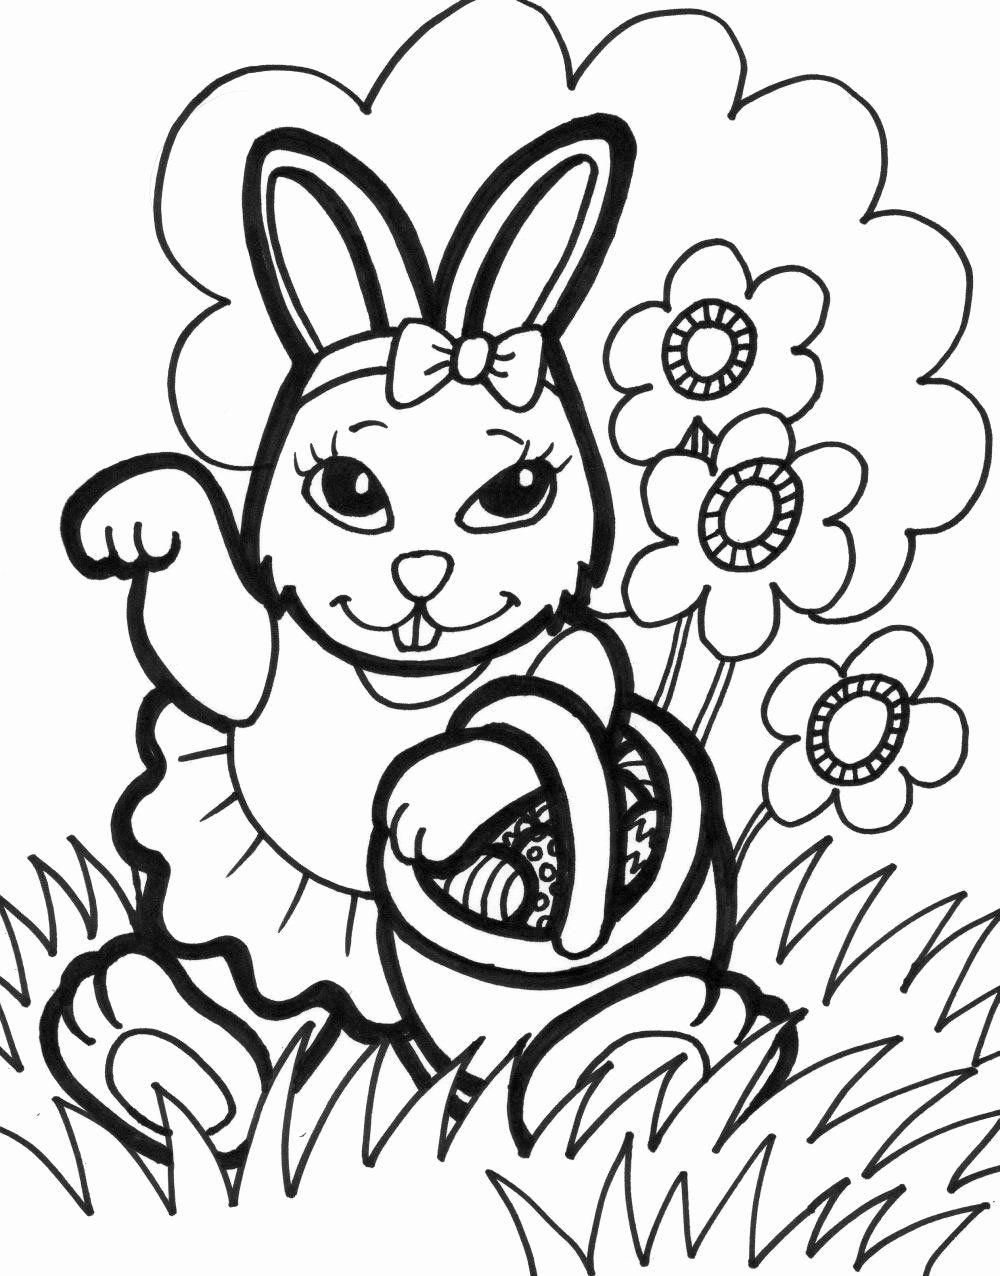 Spring Bunny Coloring Pages   Viati Coloring   Bunny coloring ...